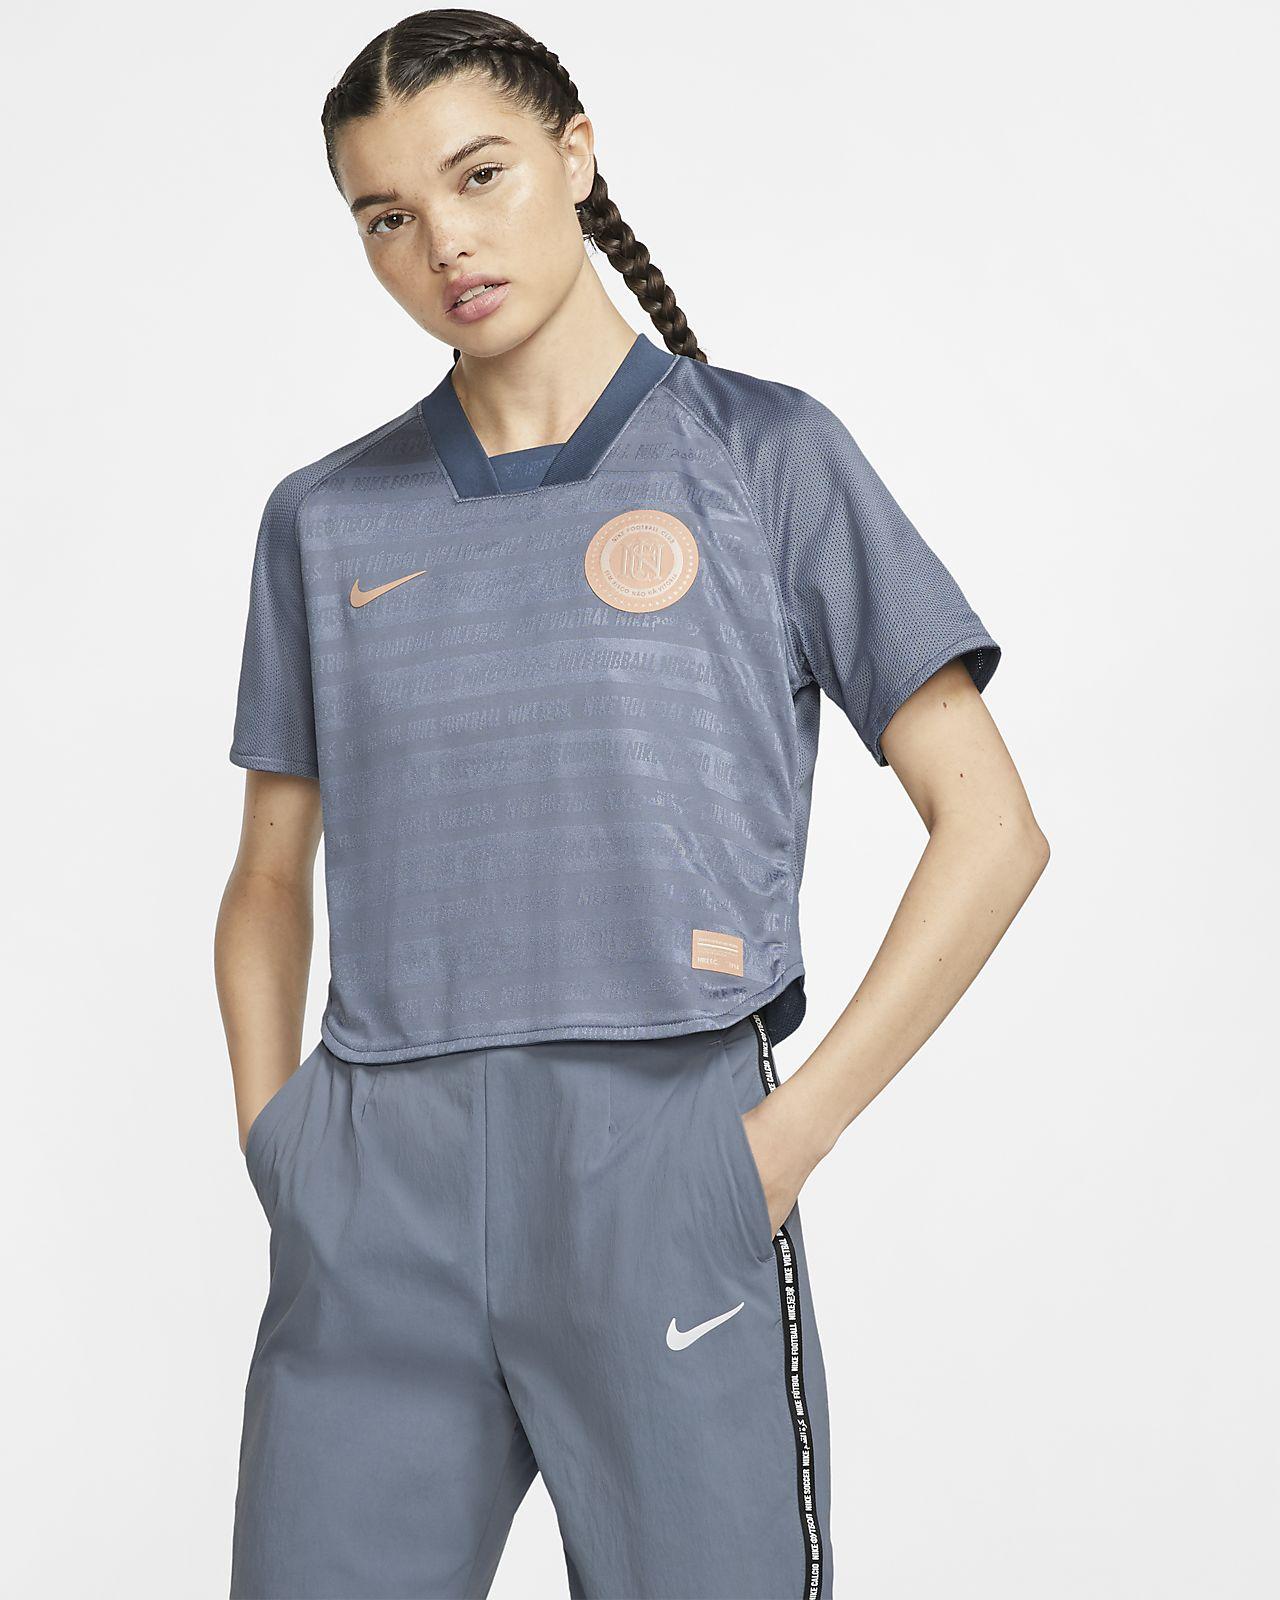 Nike F.C. Dri-FIT Women's Short-Sleeve Soccer Top